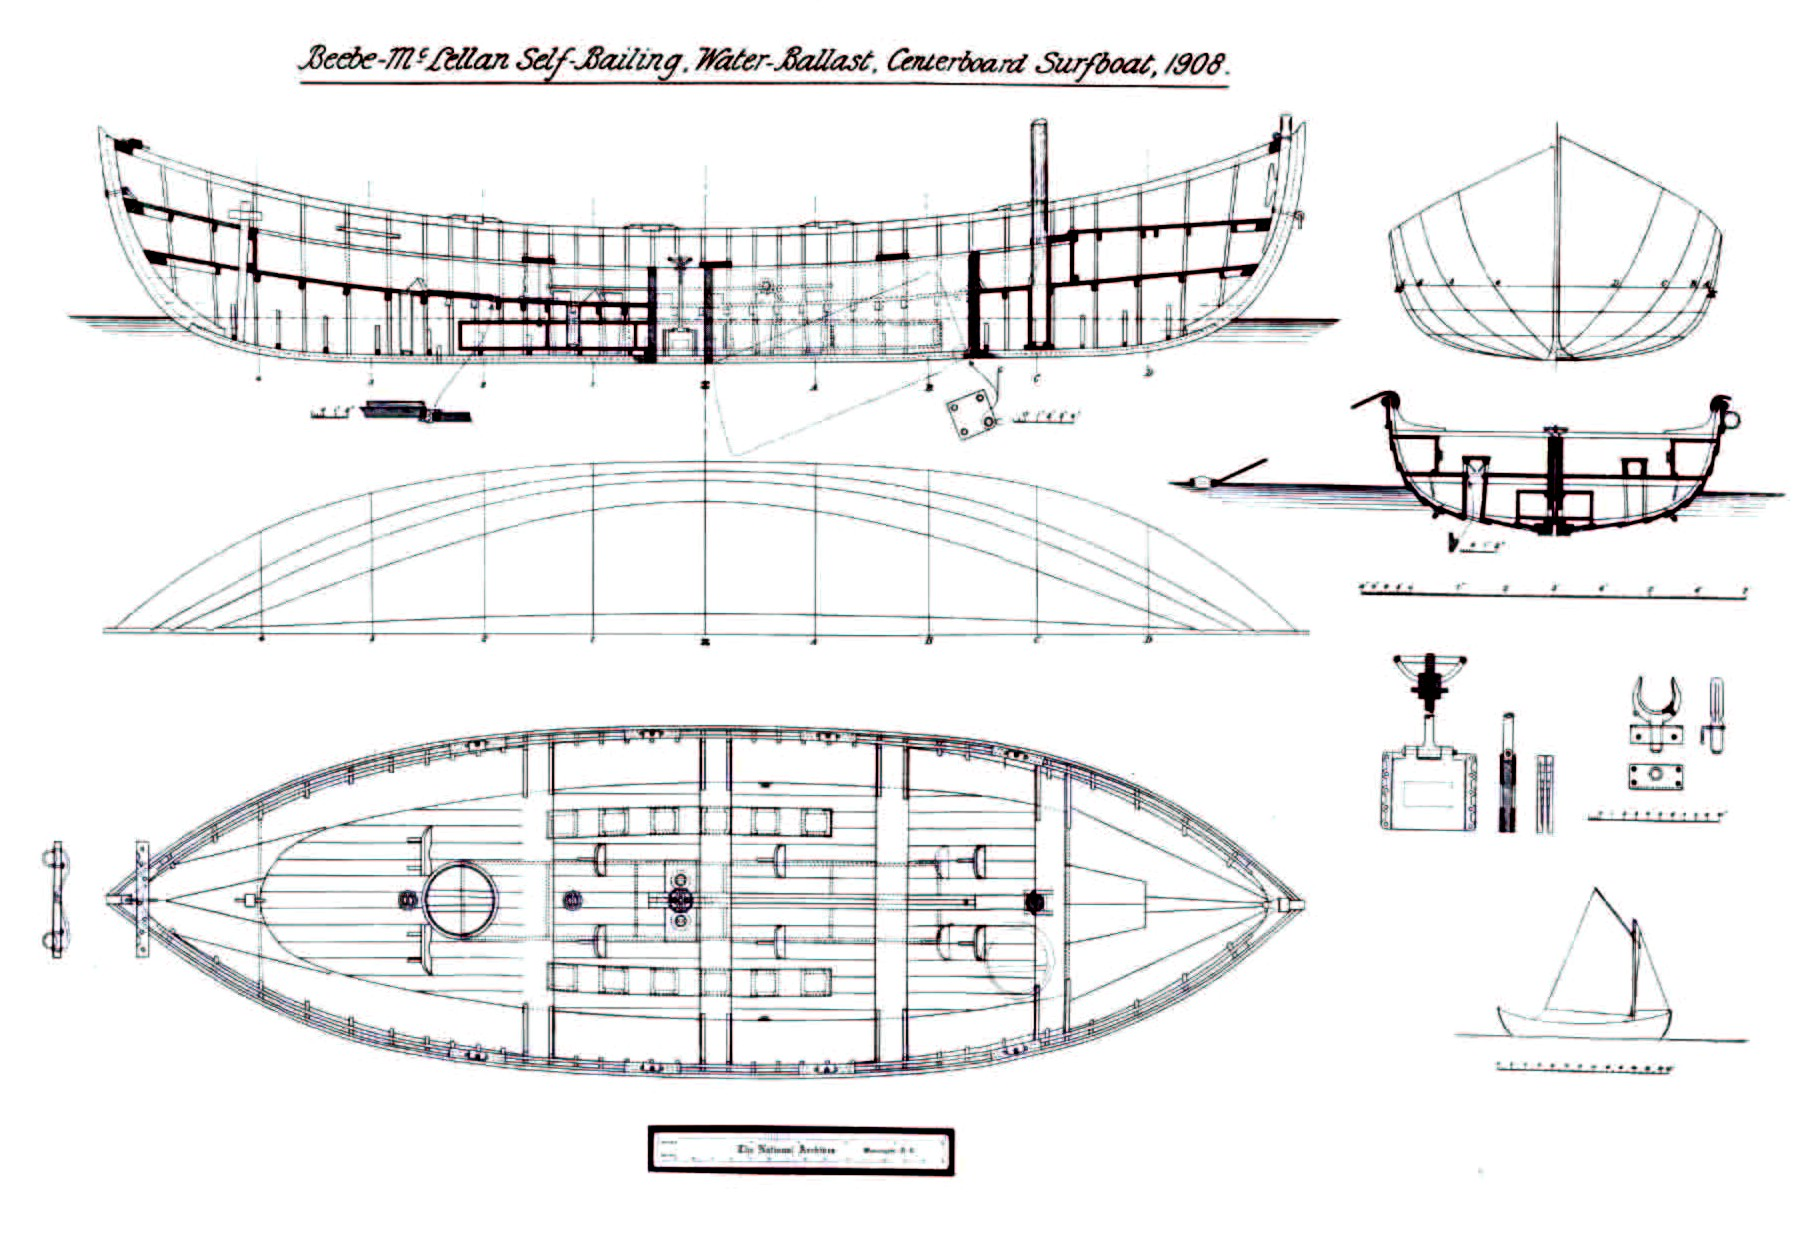 dorjun com rh dorjun com boat electrical schematics boat electrical schematics